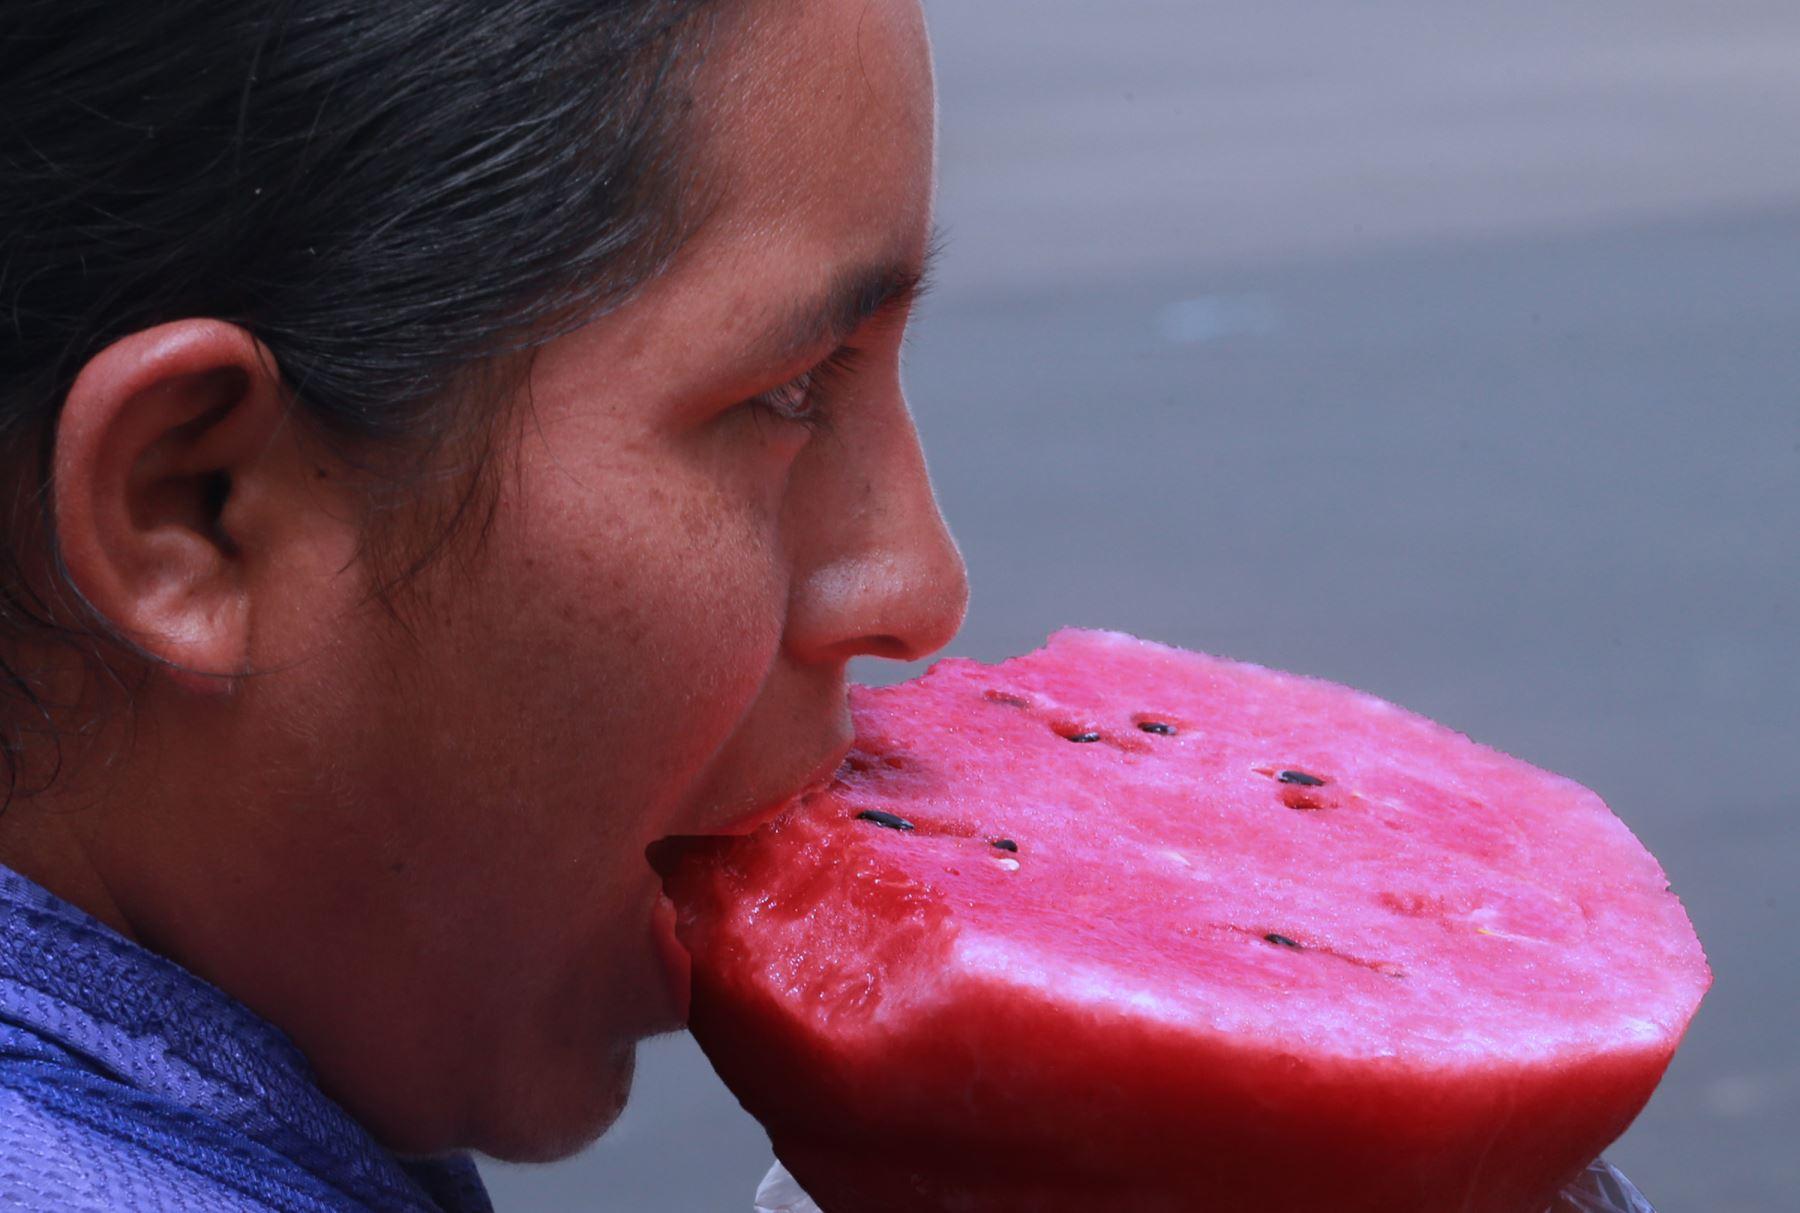 Una persona come un trozo de sandia para refrescarse del calor. Foto: ANDINA/Norman Córdova